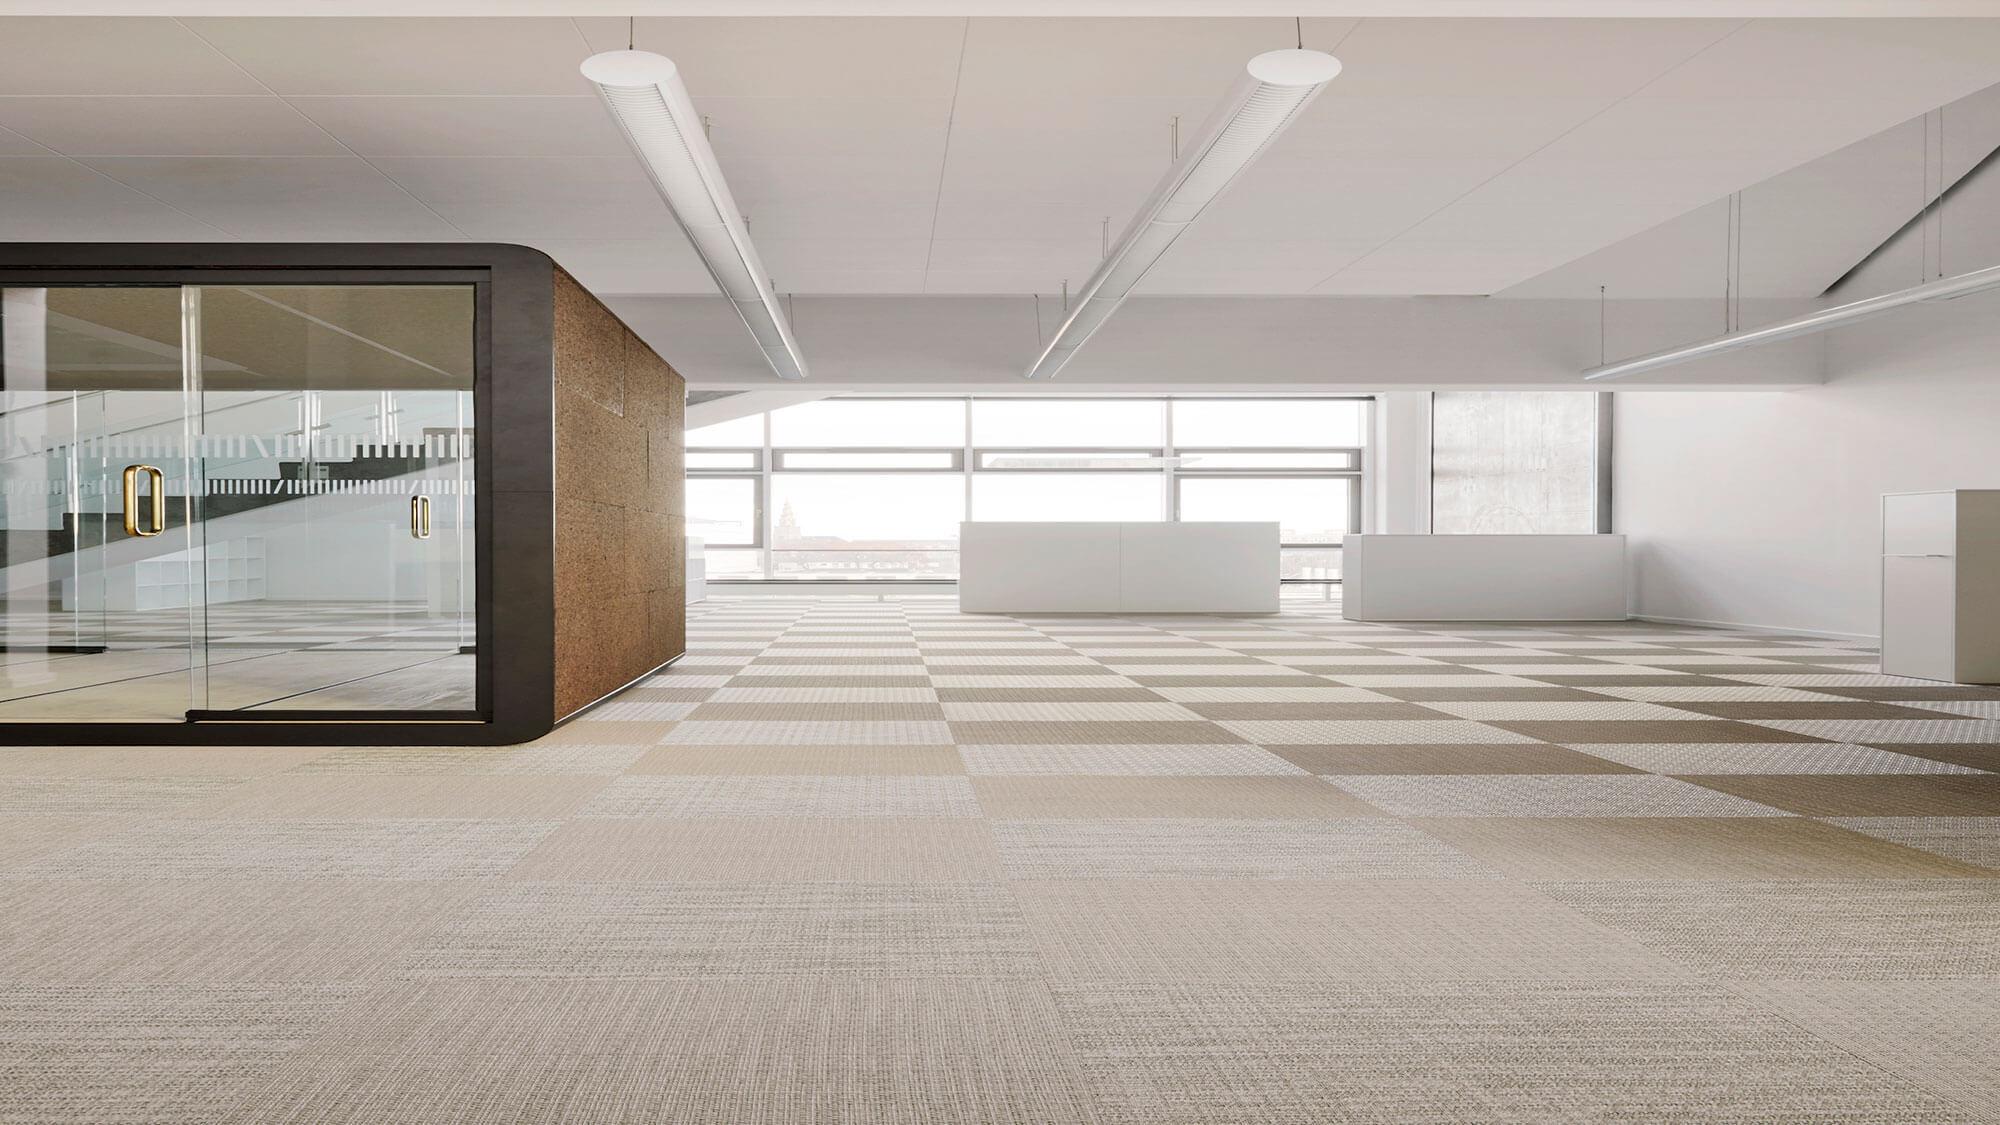 5 Brilliant Ways to Use Woven Vinyl Floors